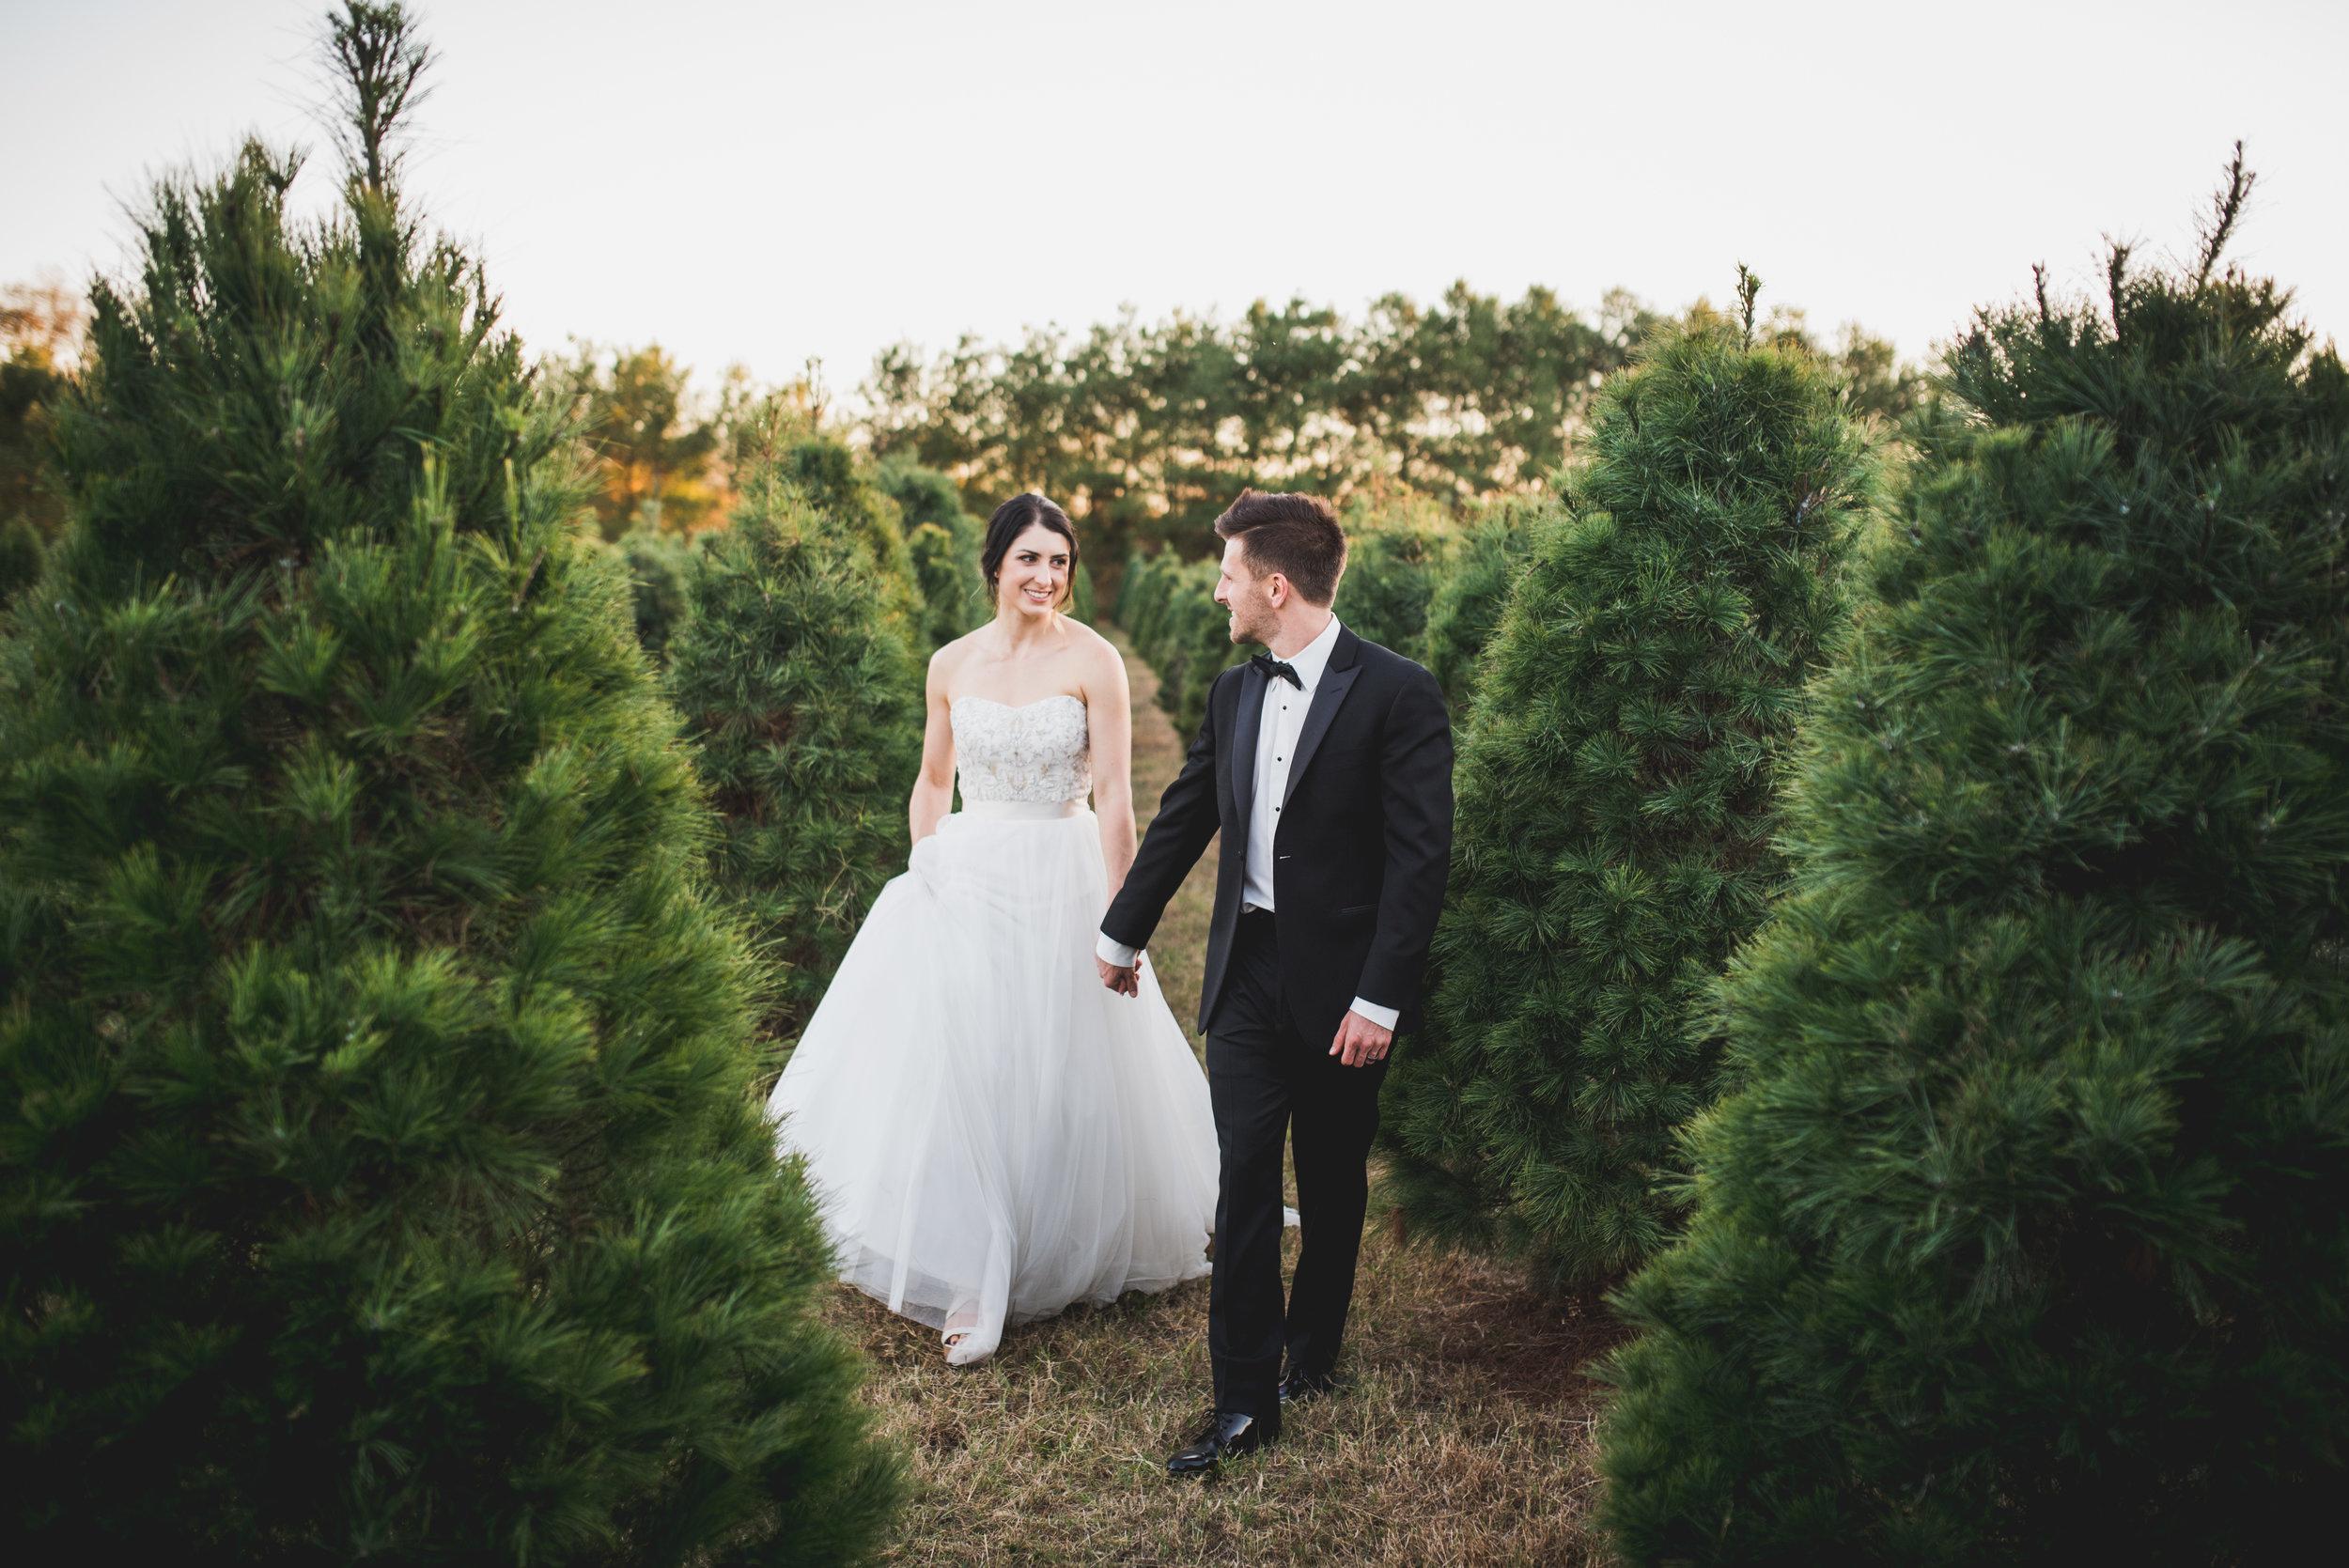 Nashville-Wedding-Photographer-Favorites142.jpg